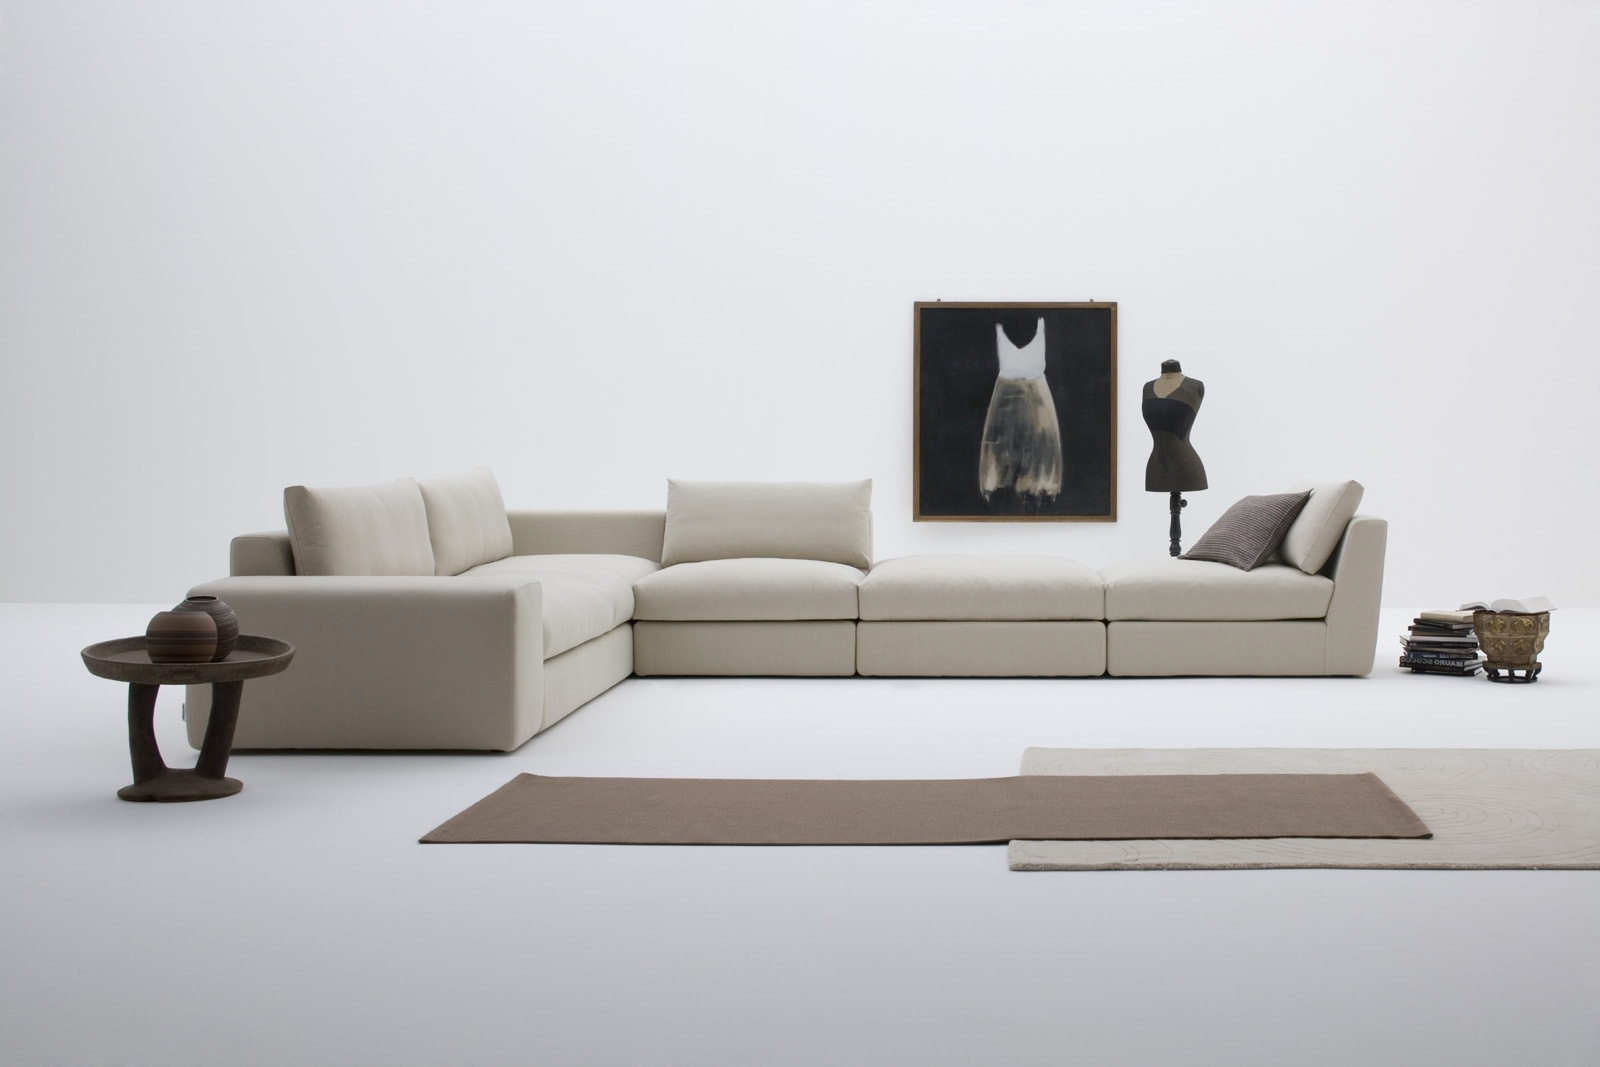 Newport Sofas With Trendy Modular Sofa Newport, Alberta Salotti – Luxury Furniture Mr (View 14 of 20)